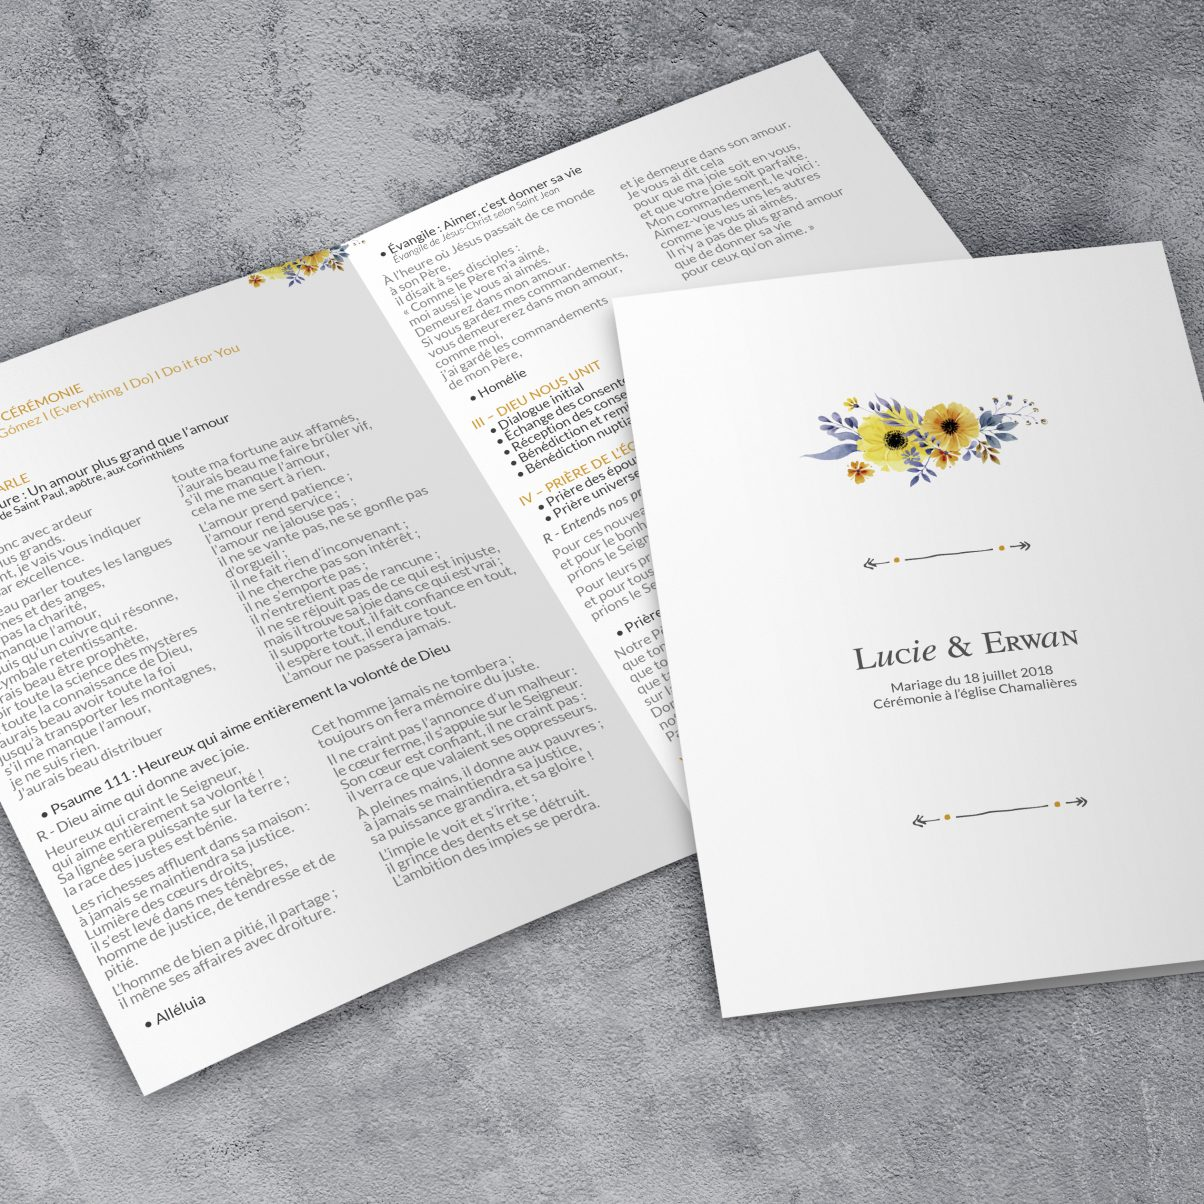 Livret de messe - Mariage - Lucie & Erwan - OK